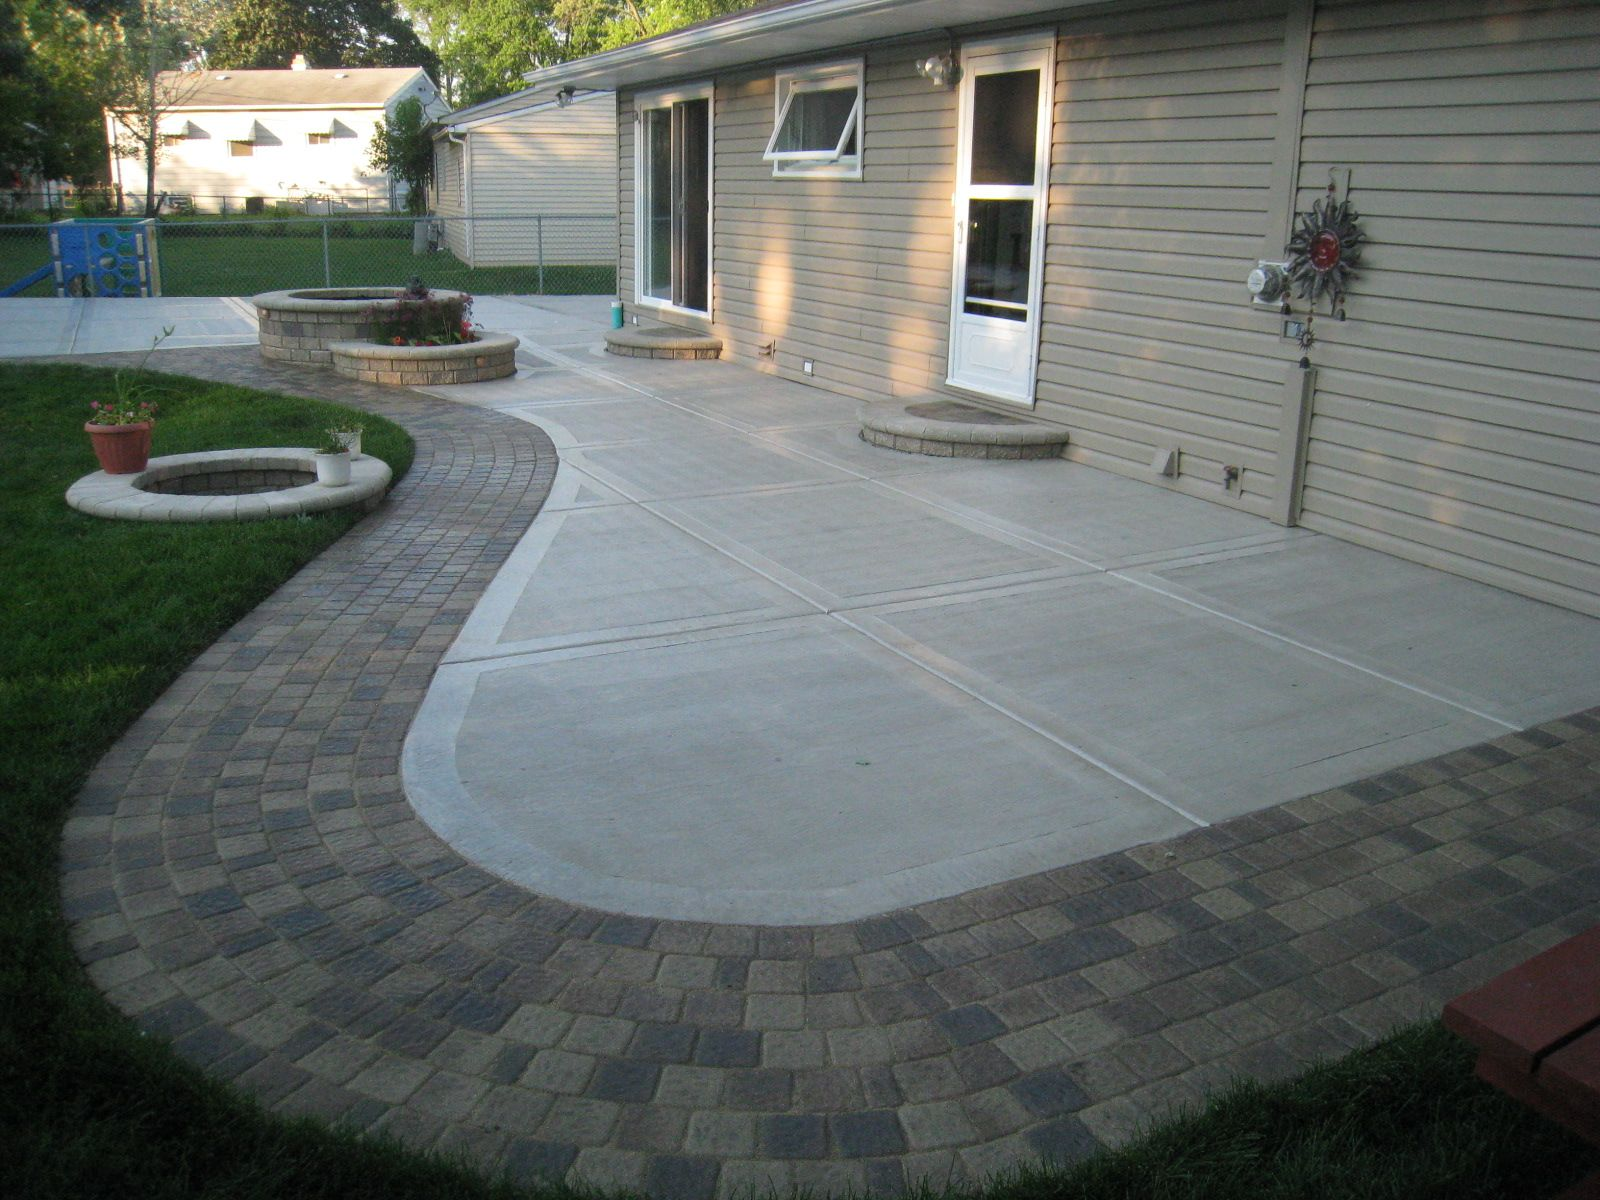 Concrete Patio Concrete Patio Designs Poured Concrete Patio